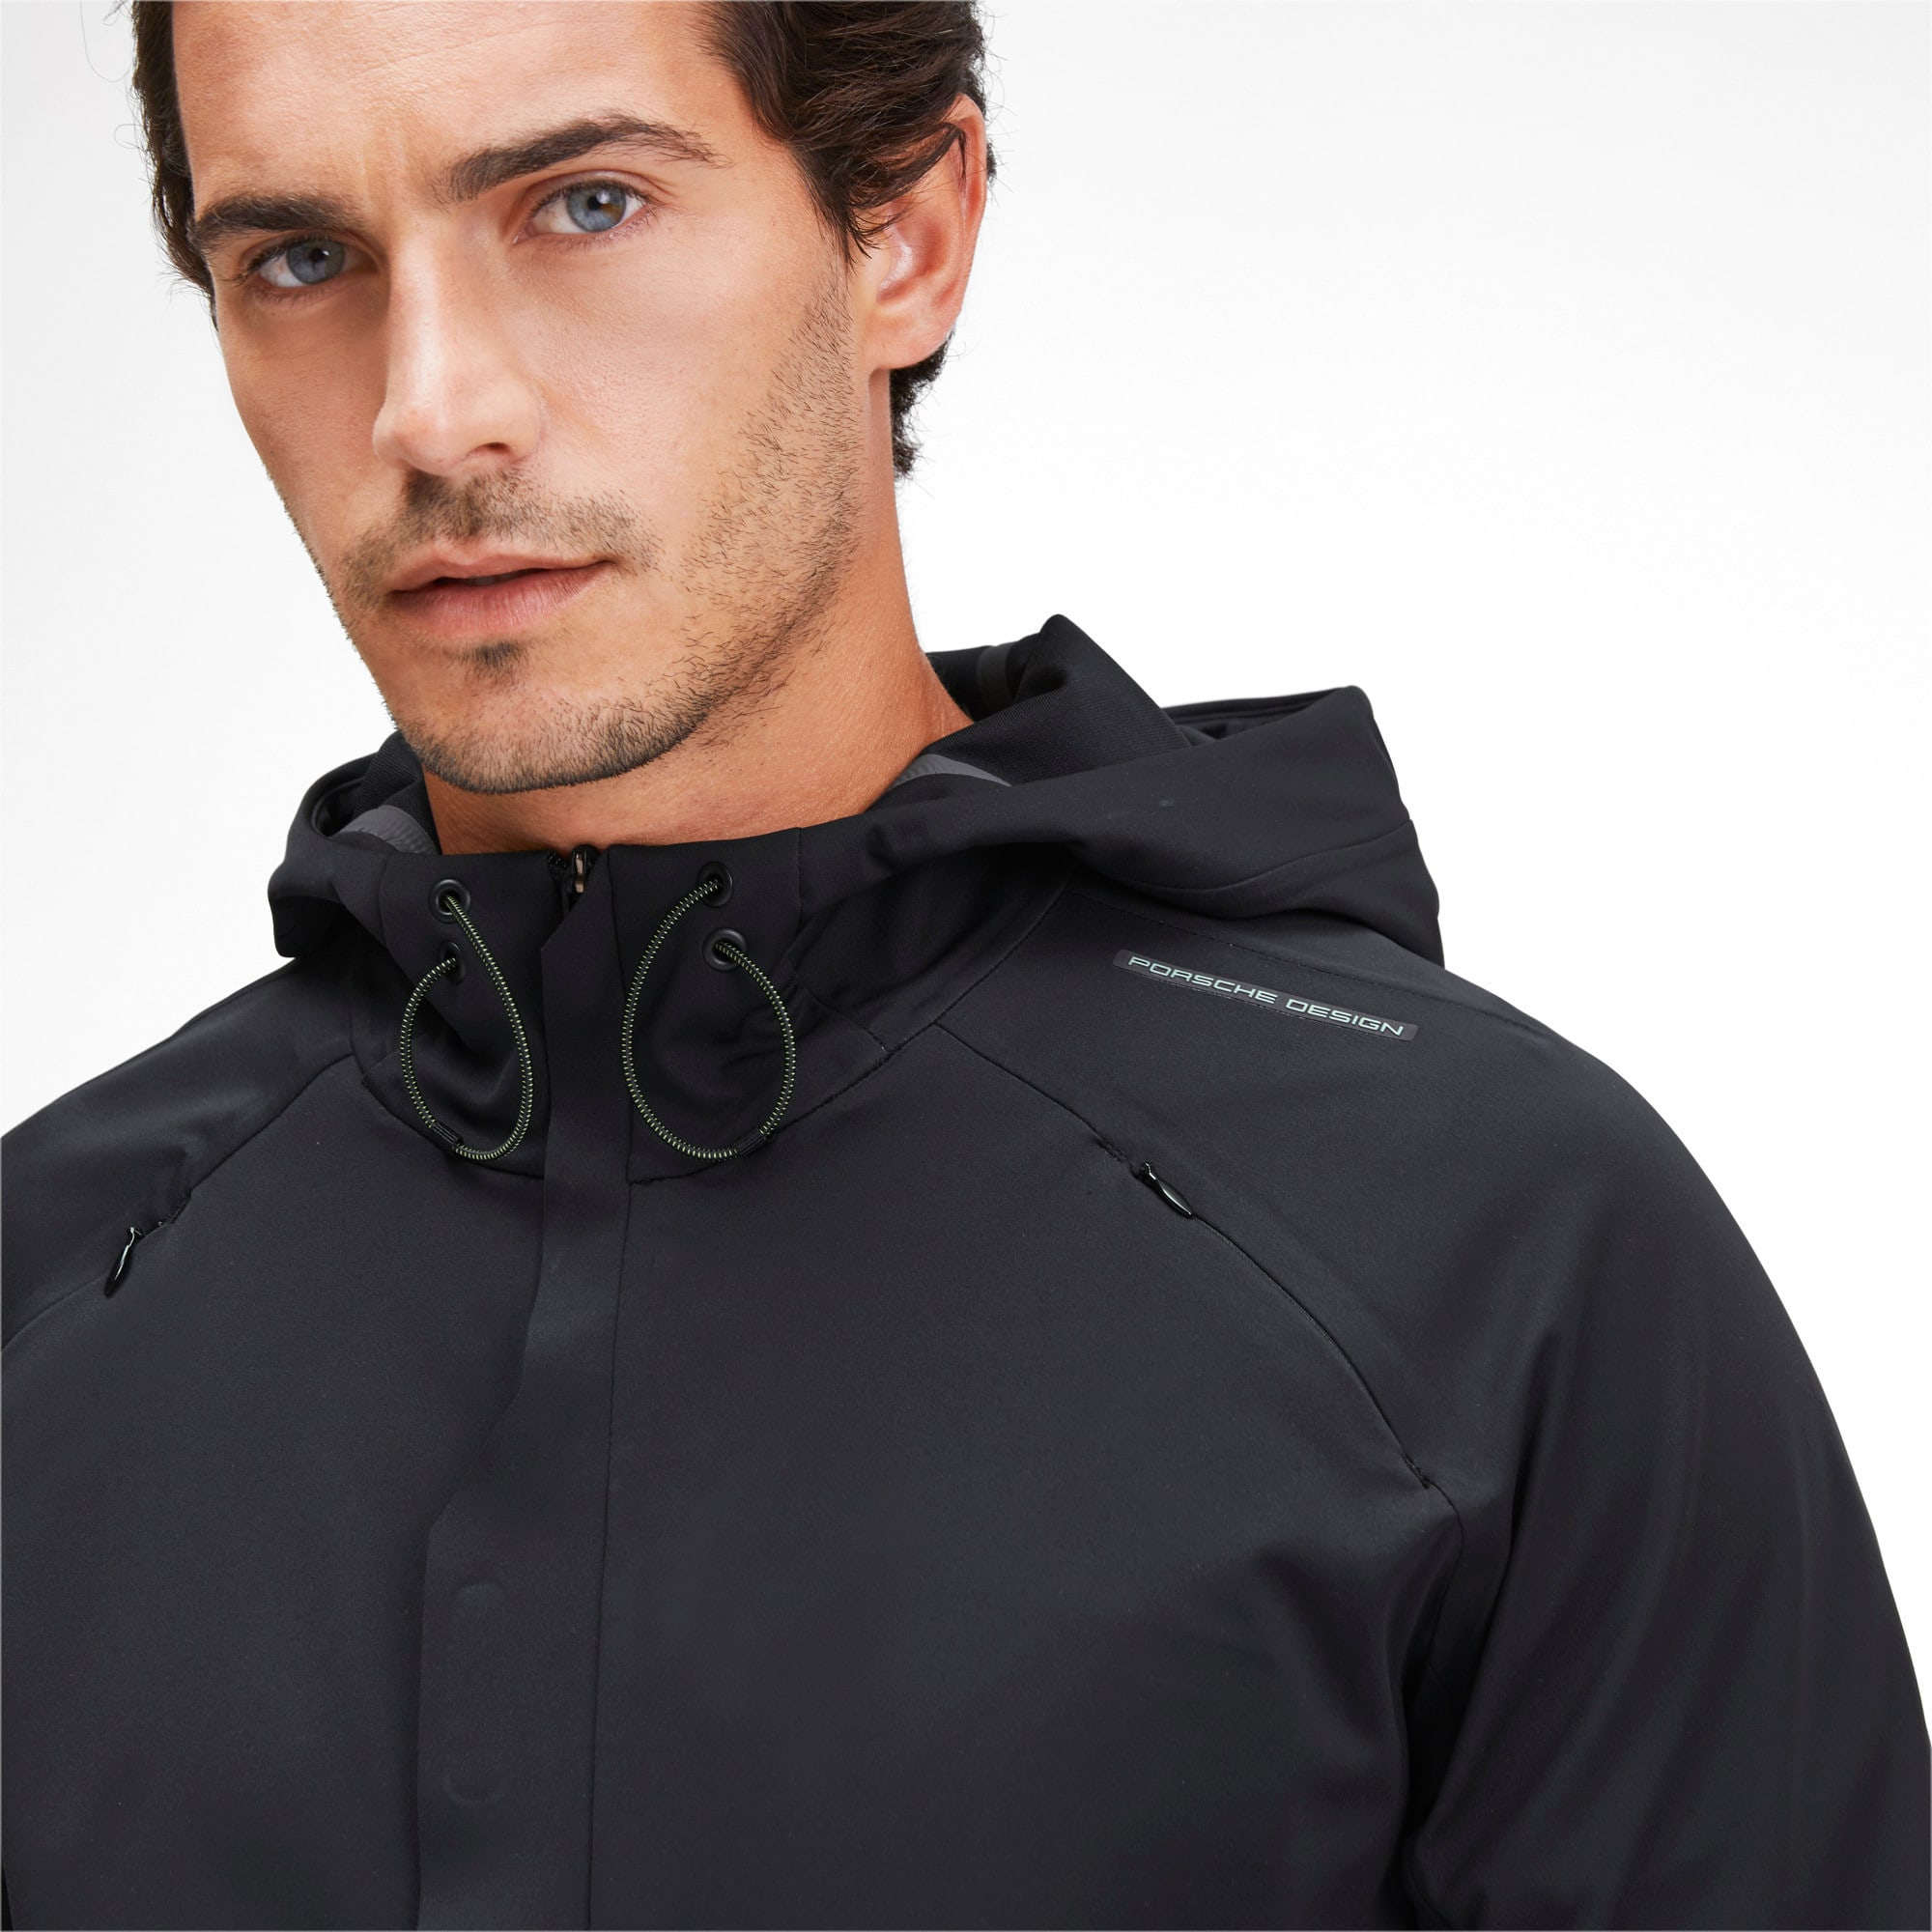 Thumbnail 6 of Porsche Design Active All Day Men's Jacket, Jet Black, medium